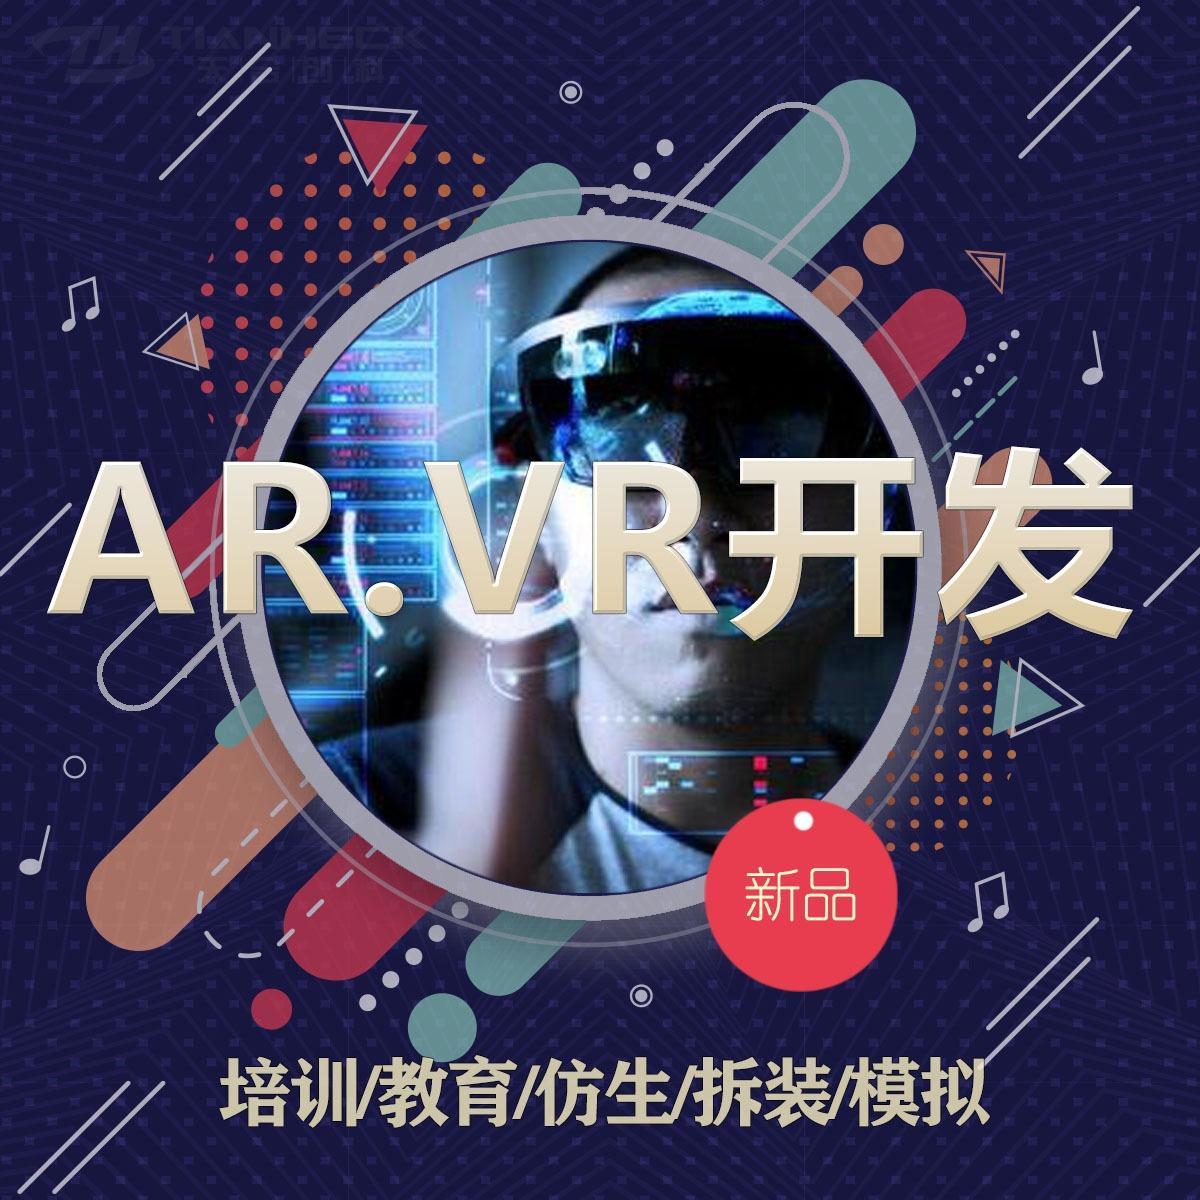 ARVR培训教育unity3D/UE4开发遗址复原互动展示